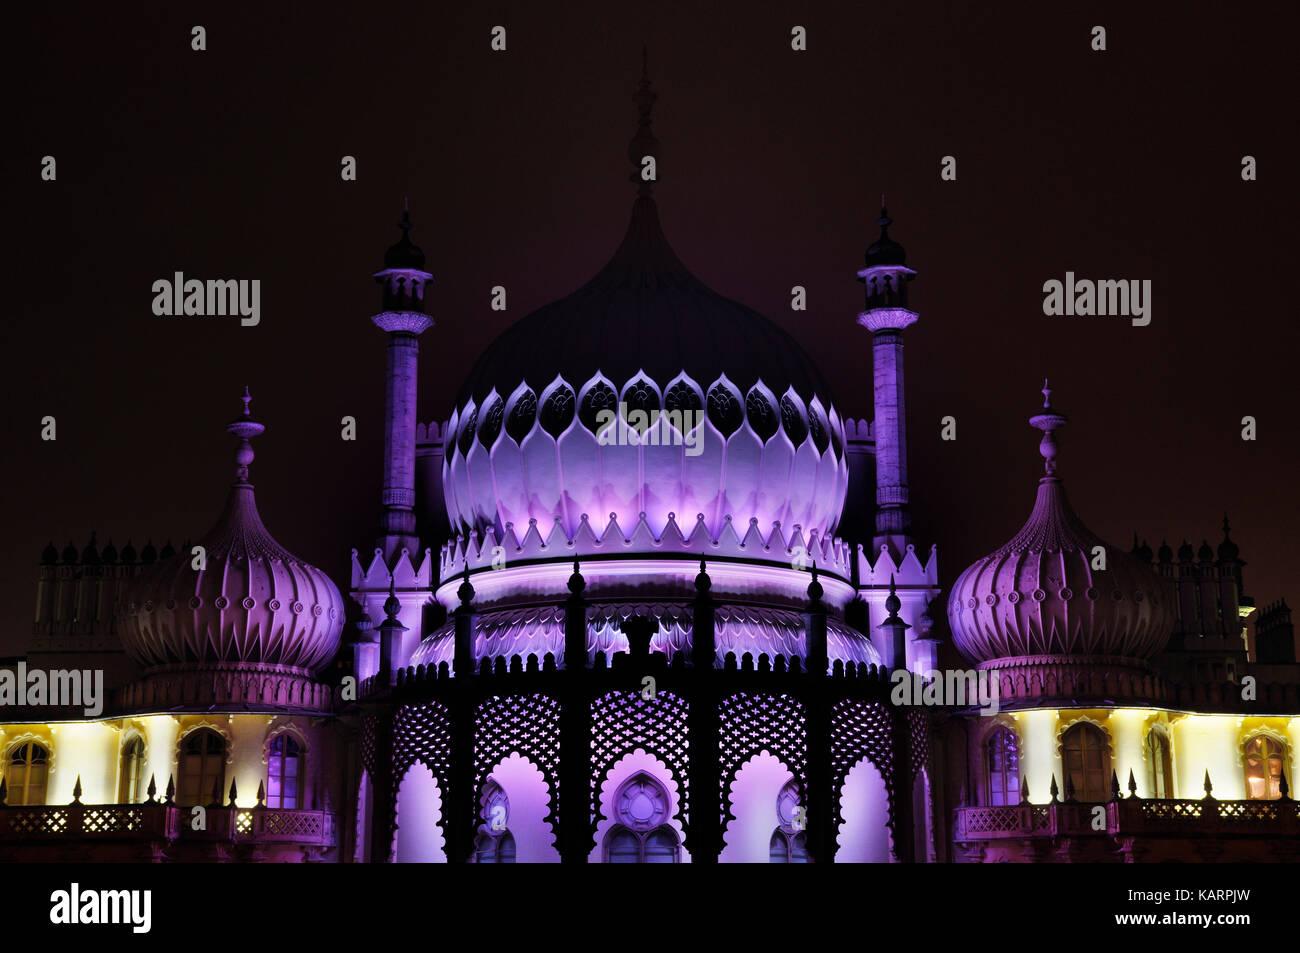 Brighton Royal Pavilion at night, East Sussex, England, UK Photo Stock